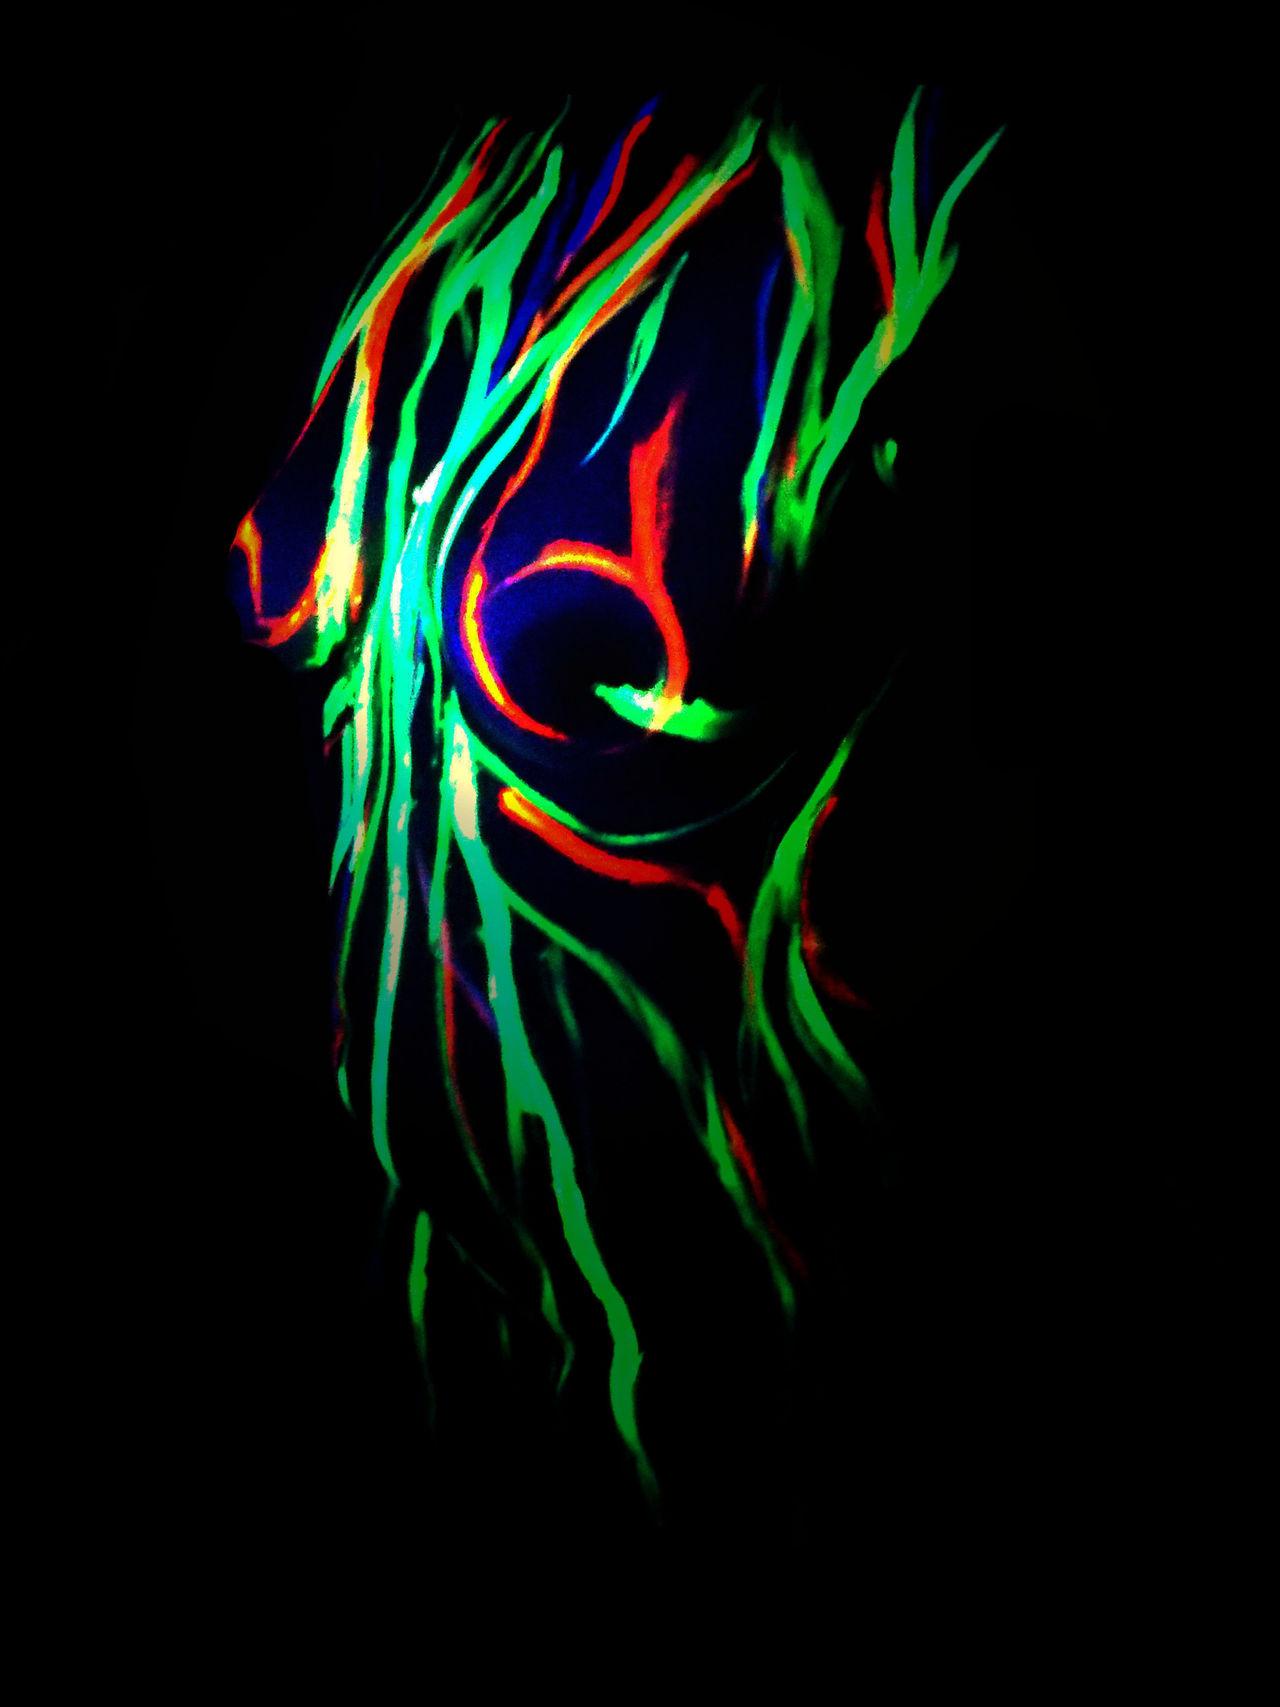 Bodypainting -breast ArtWork Art Shine Glow Colors Acrylic Backgrounds Woman Portrait Woman Breast,